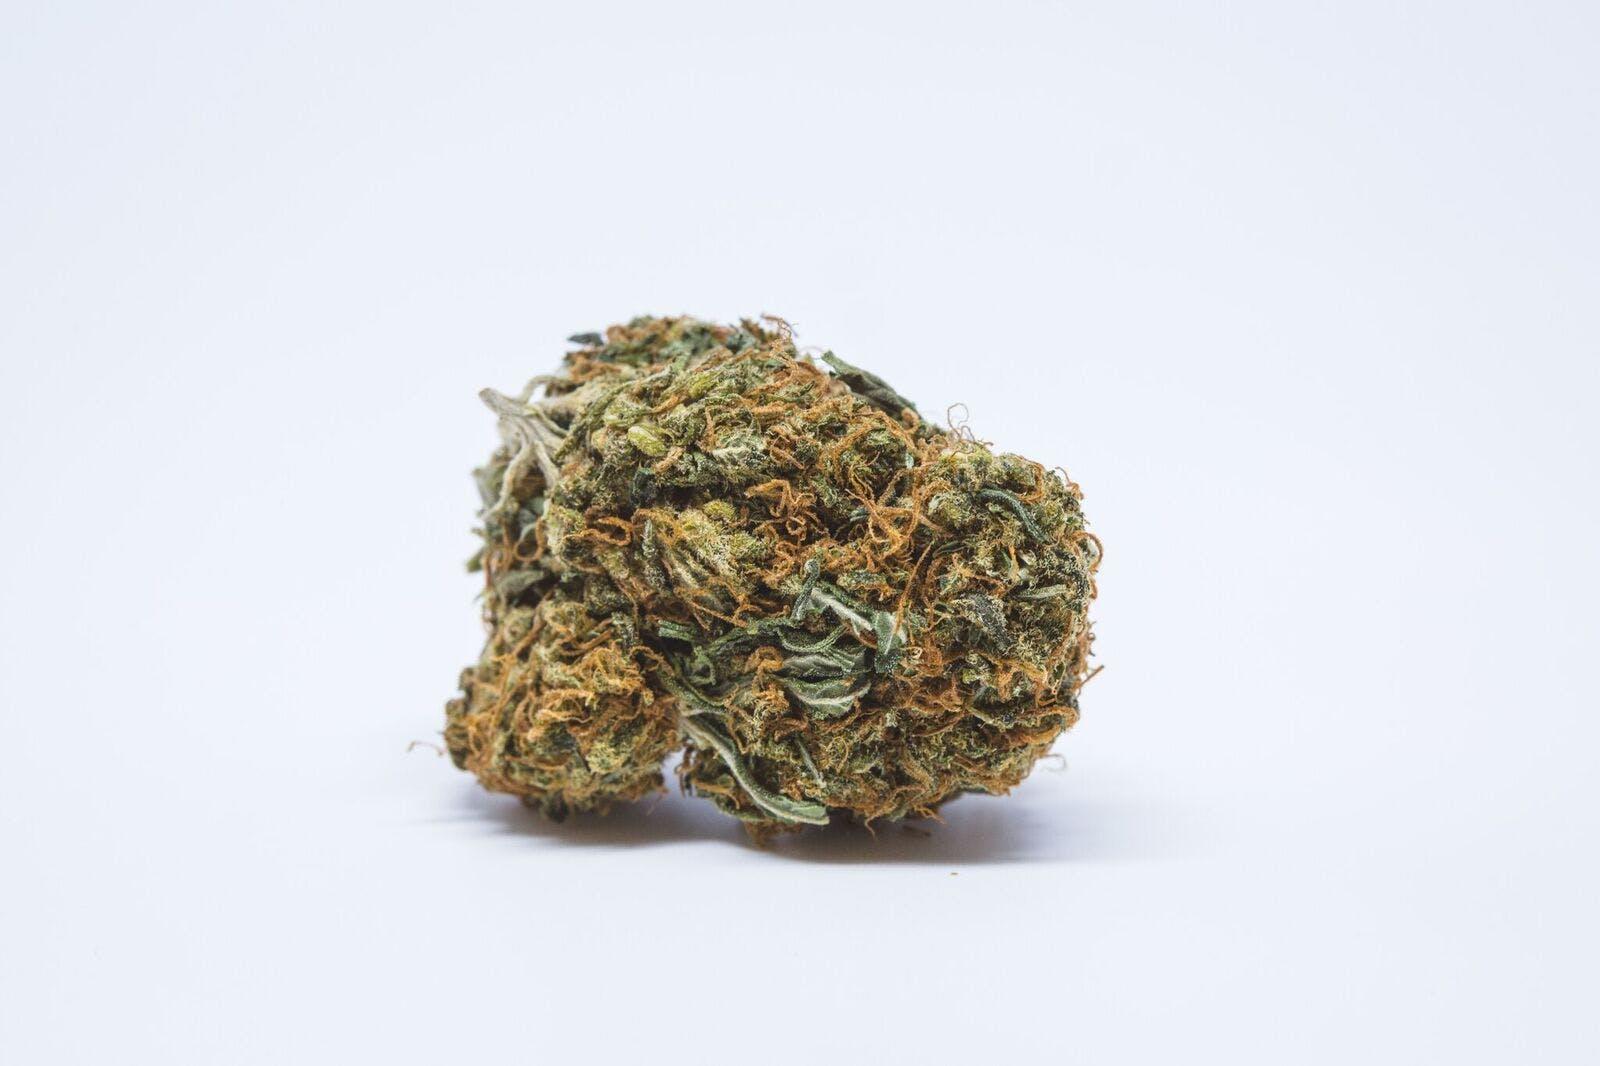 White Lavender Weed; White Lavender Cannabis Strain; White Lavender Hybrid Marijuana Strain